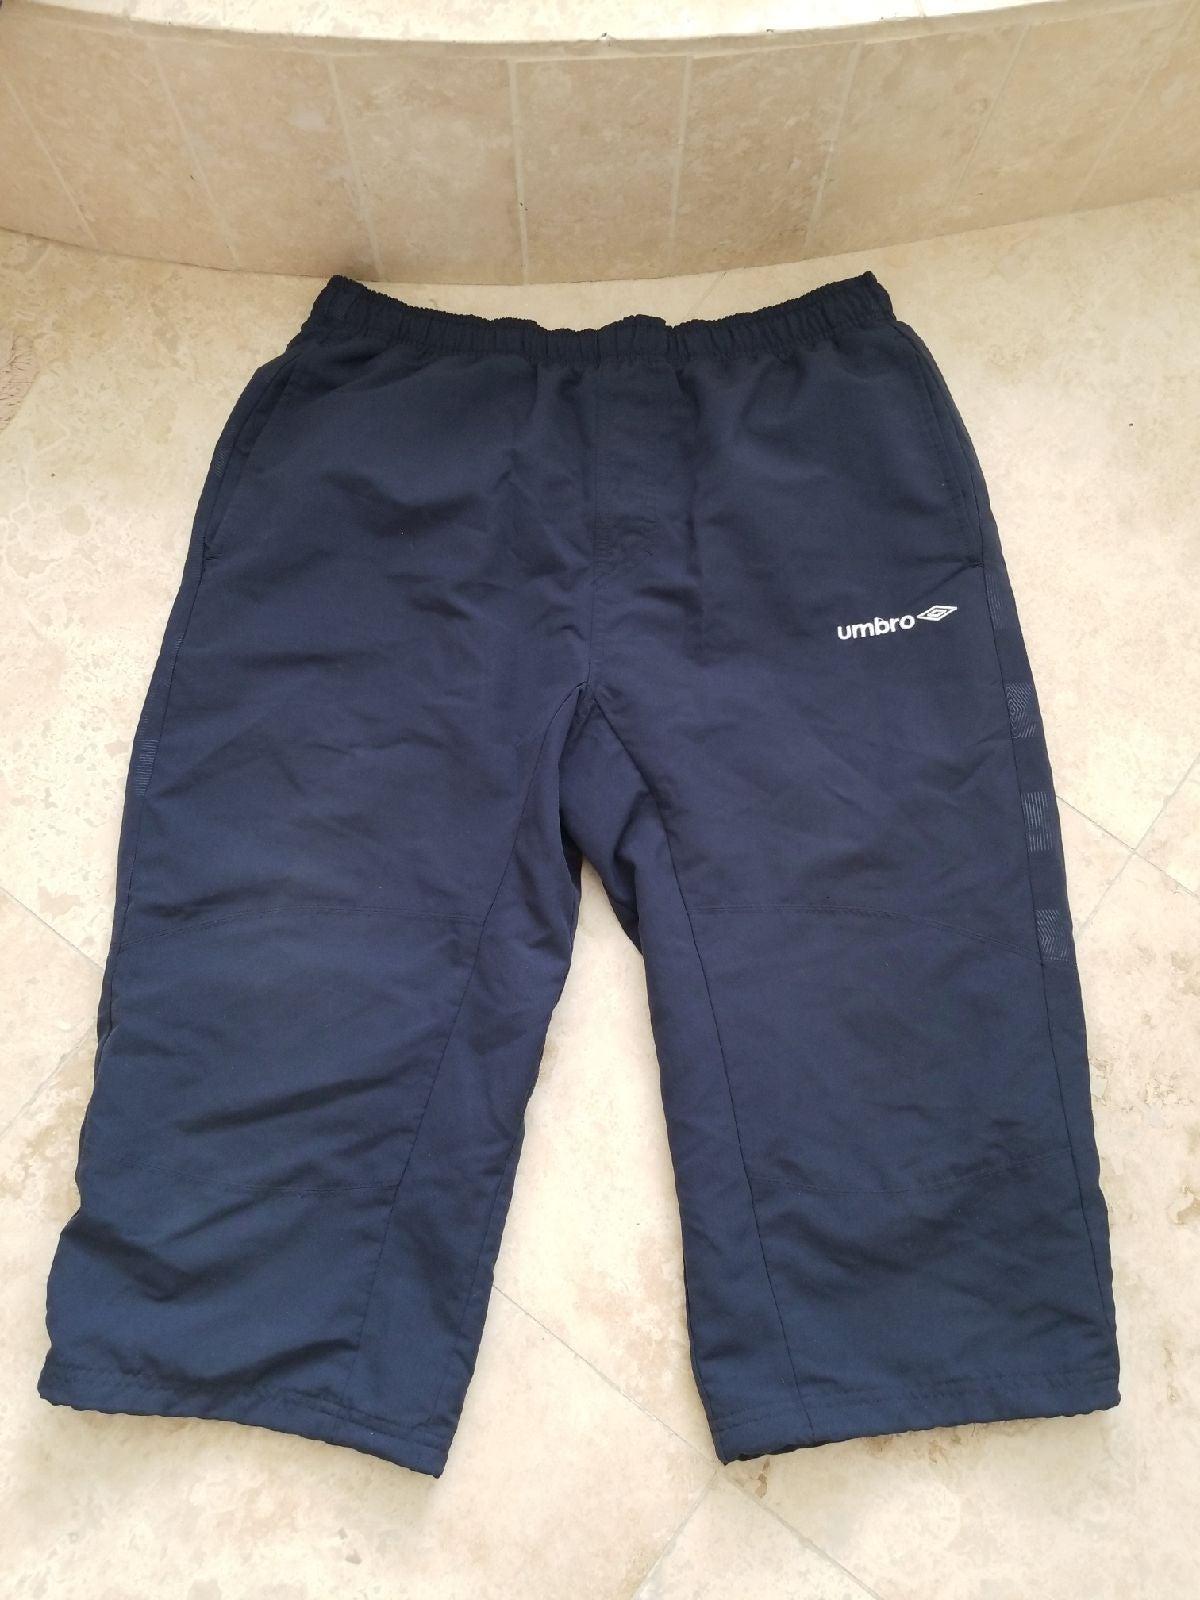 Umbro 3/4 Pants/Swim Trunks